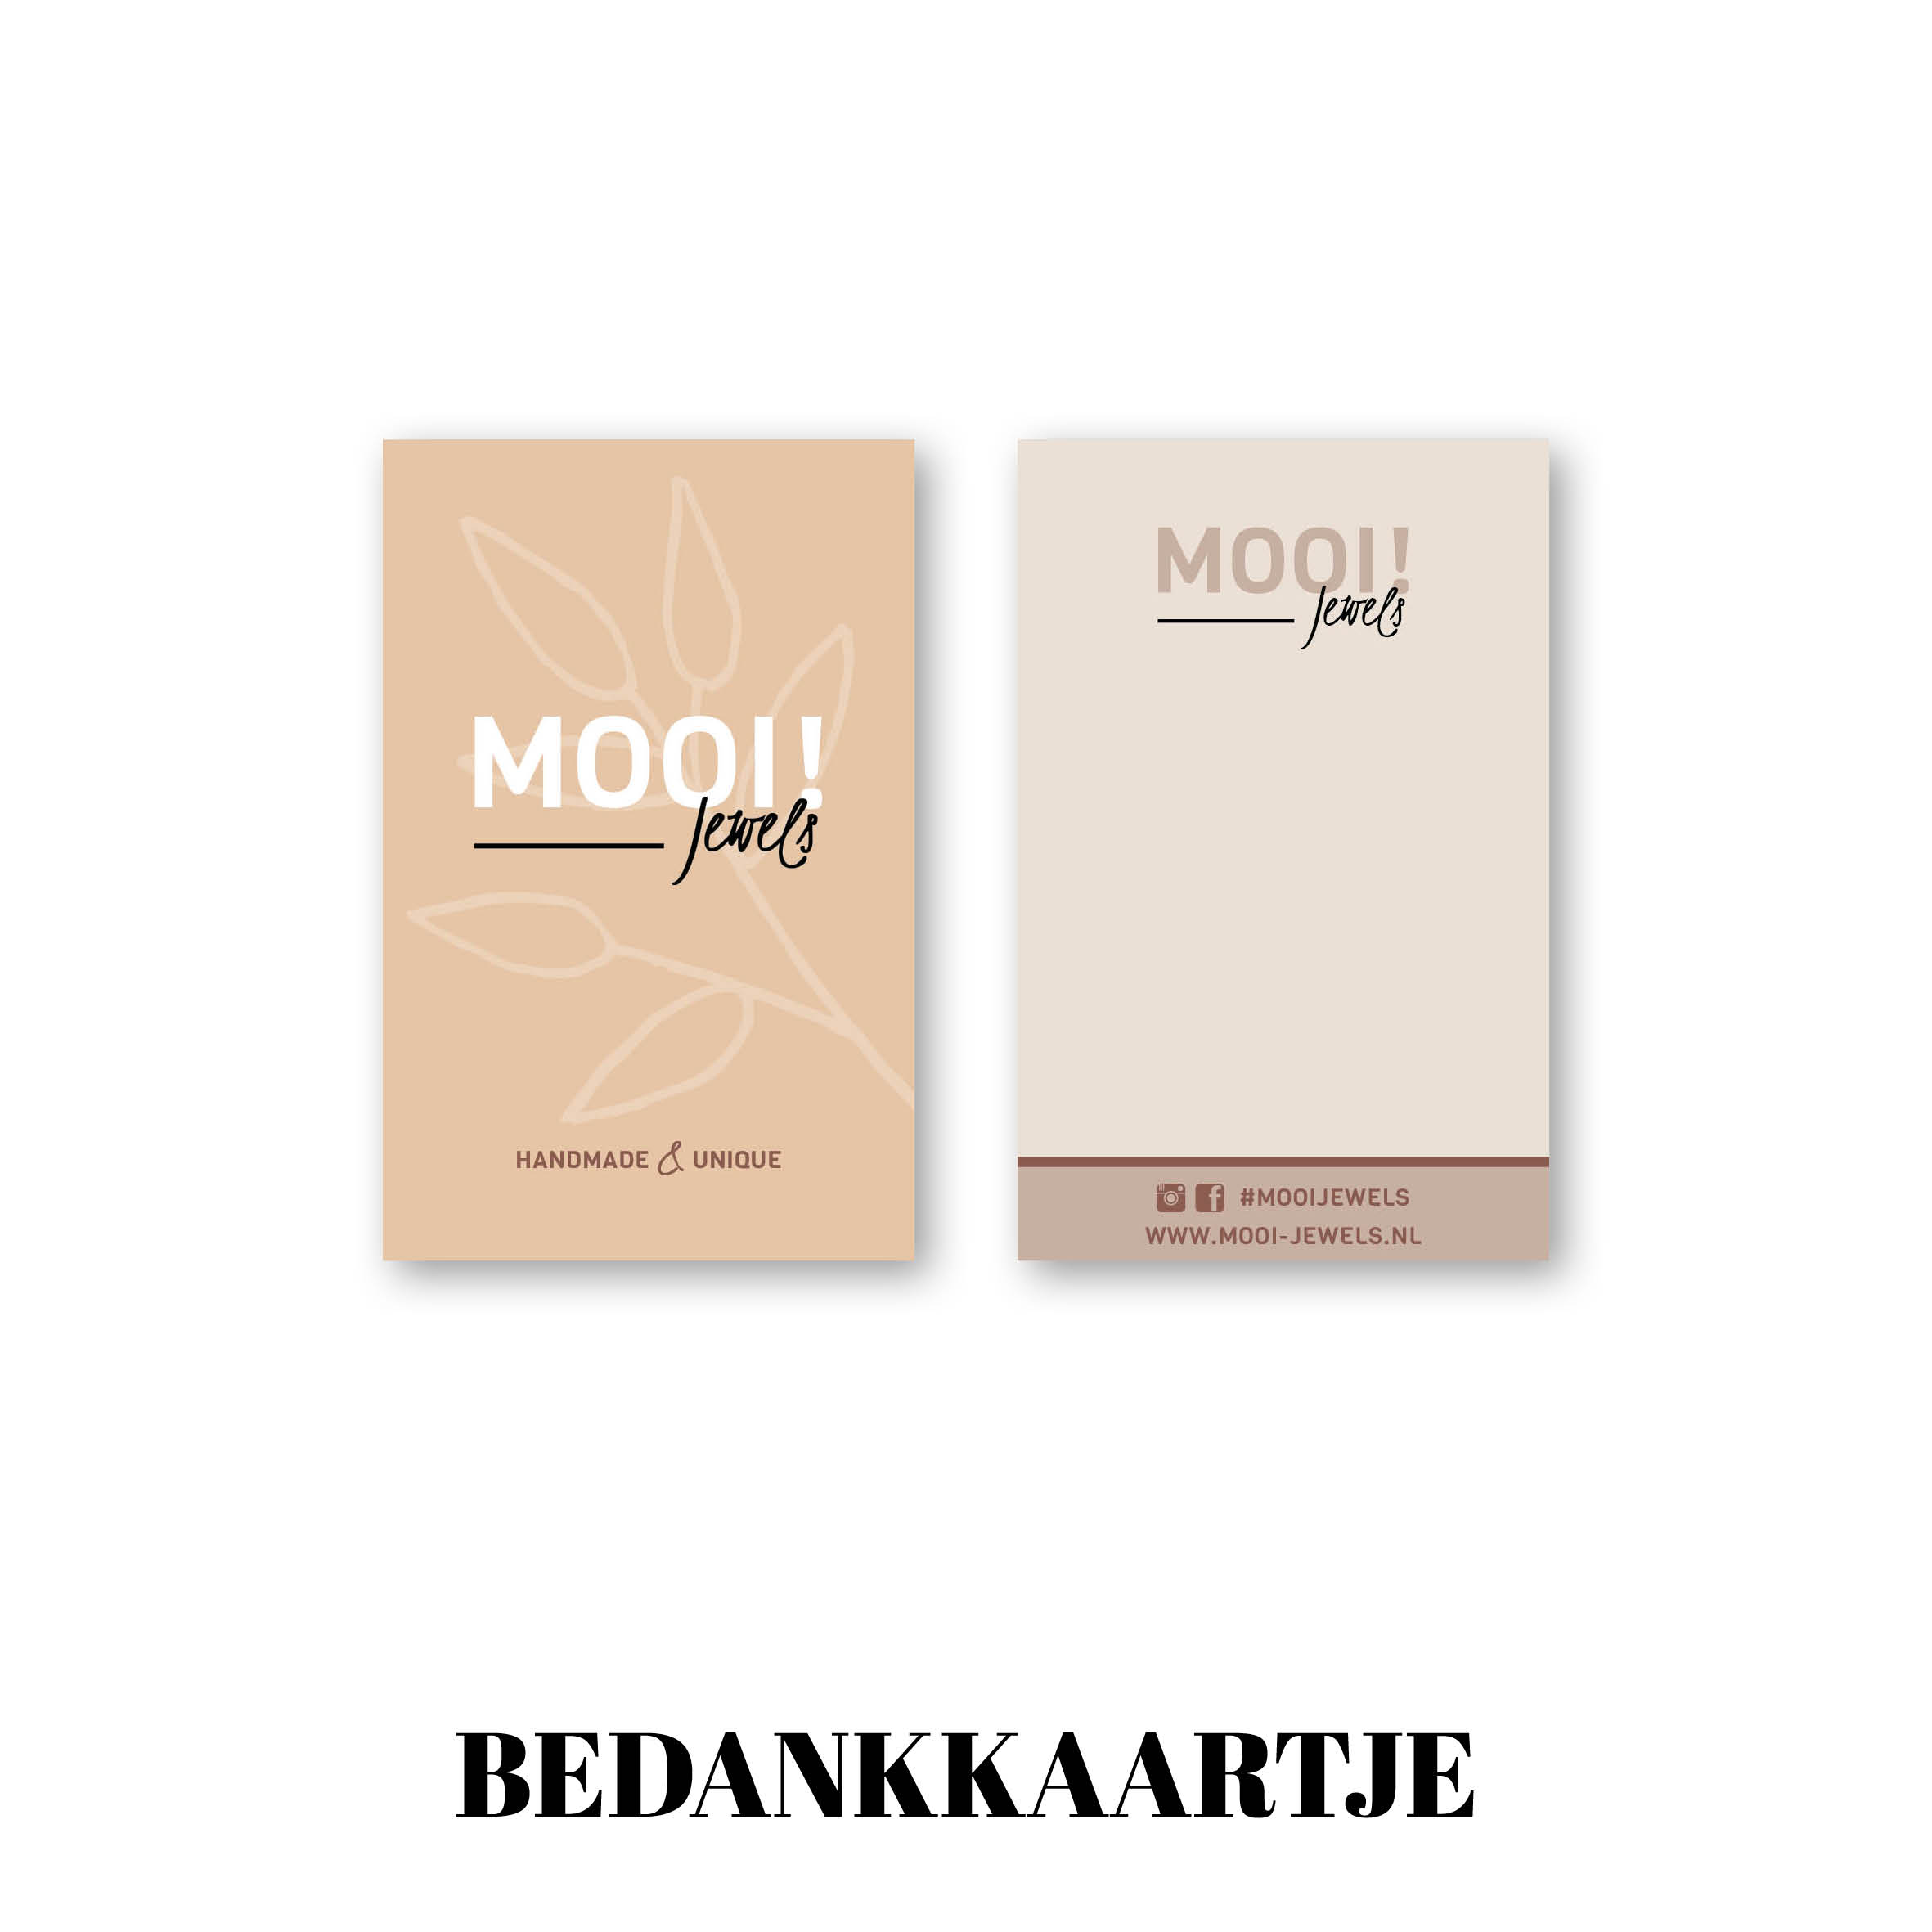 Branding_MOOI! Jewels_8